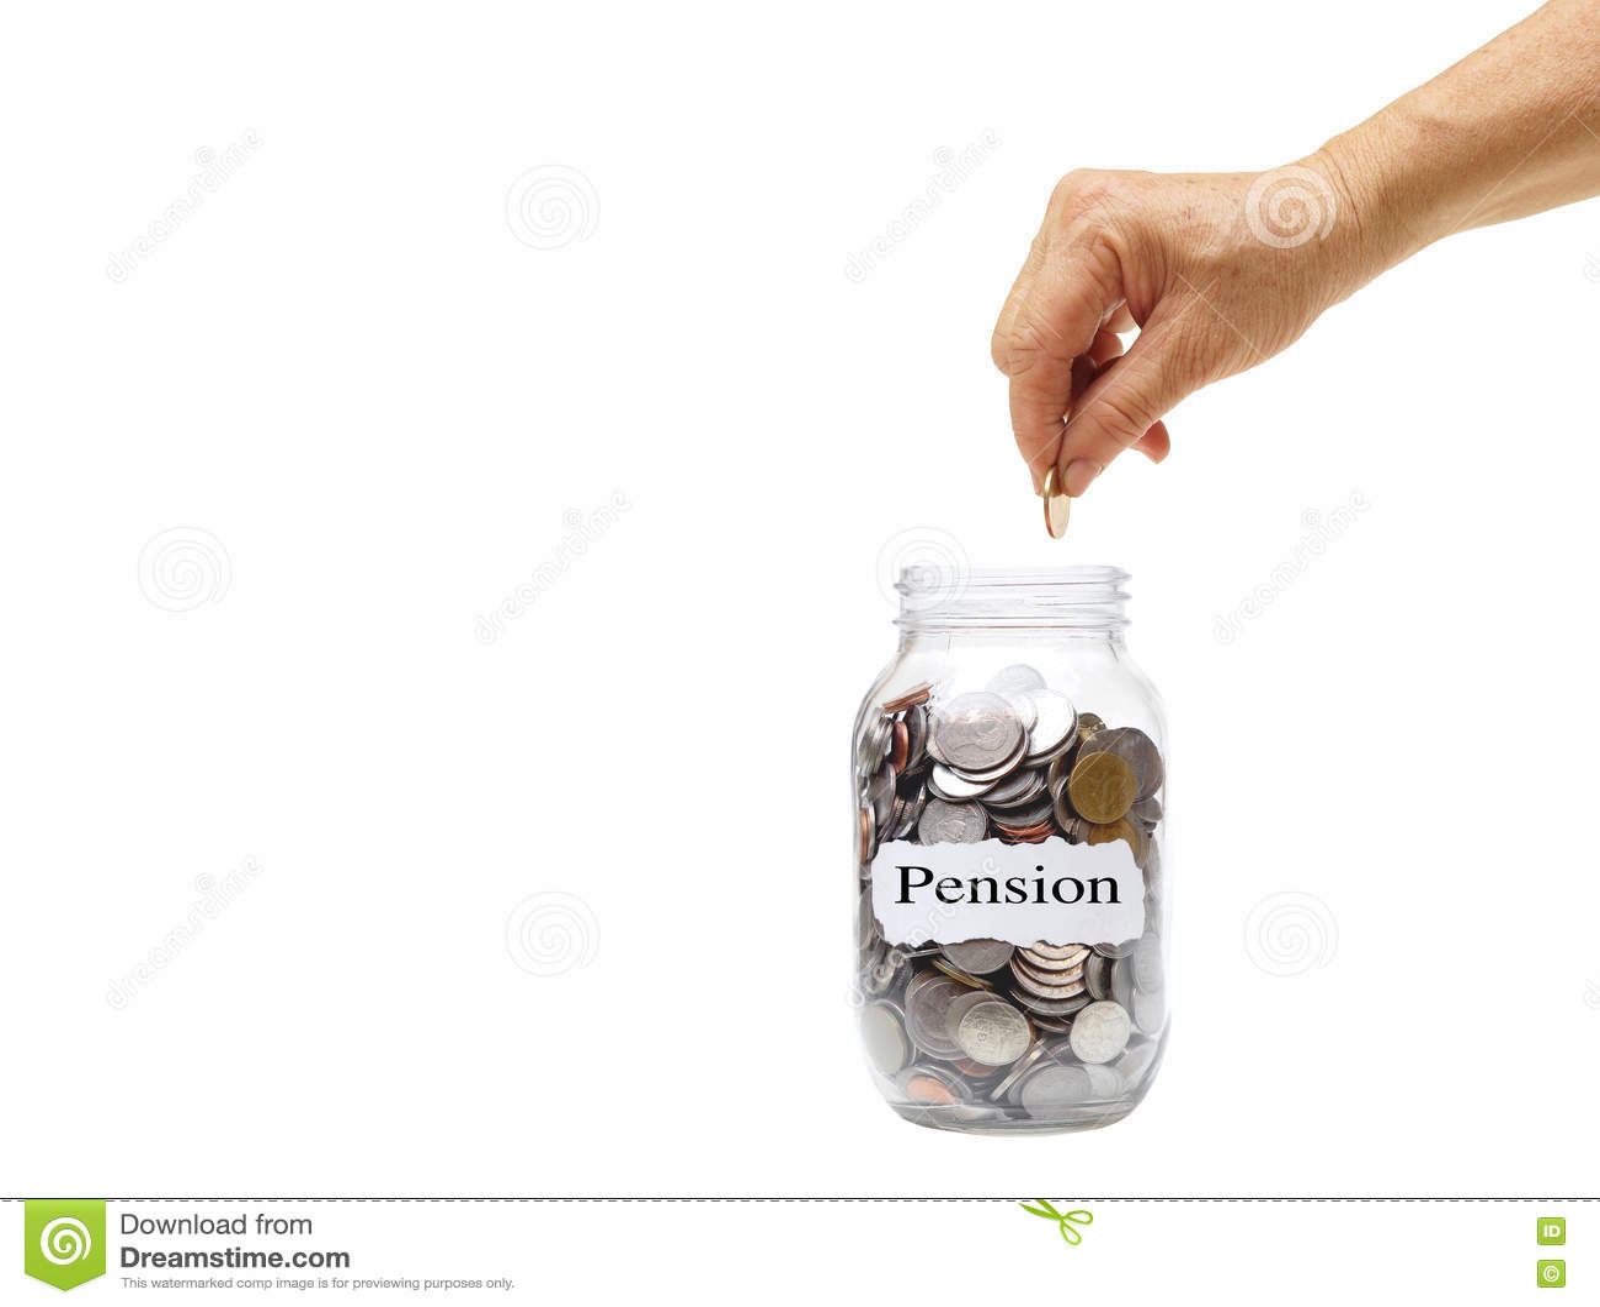 Besparing voor pensioen